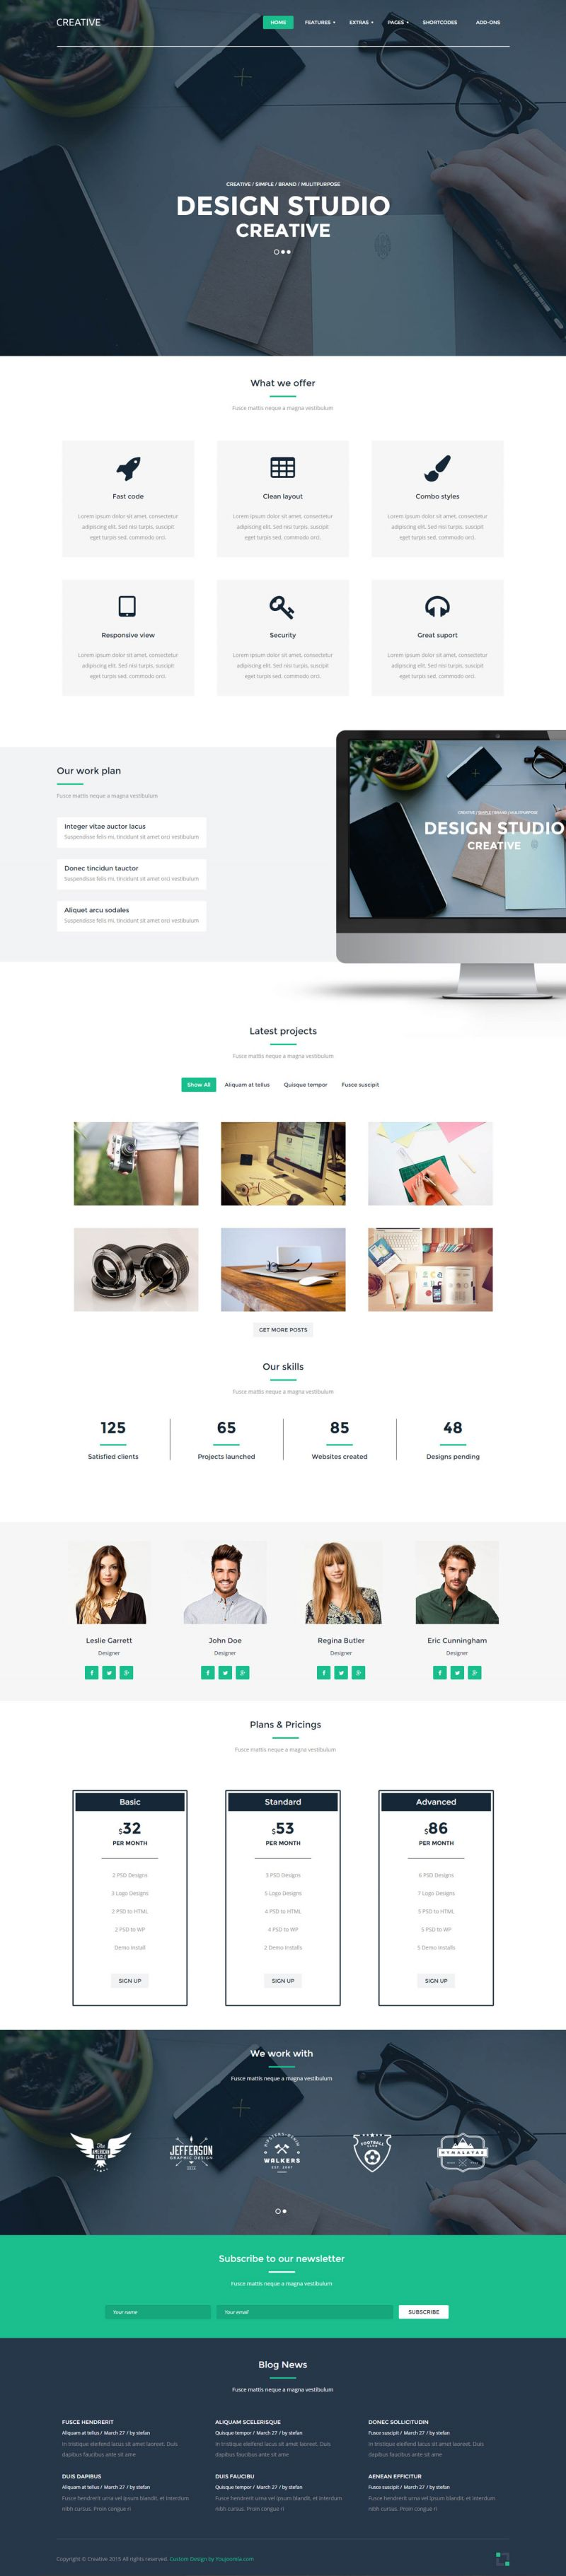 creative designer web studio joomla template